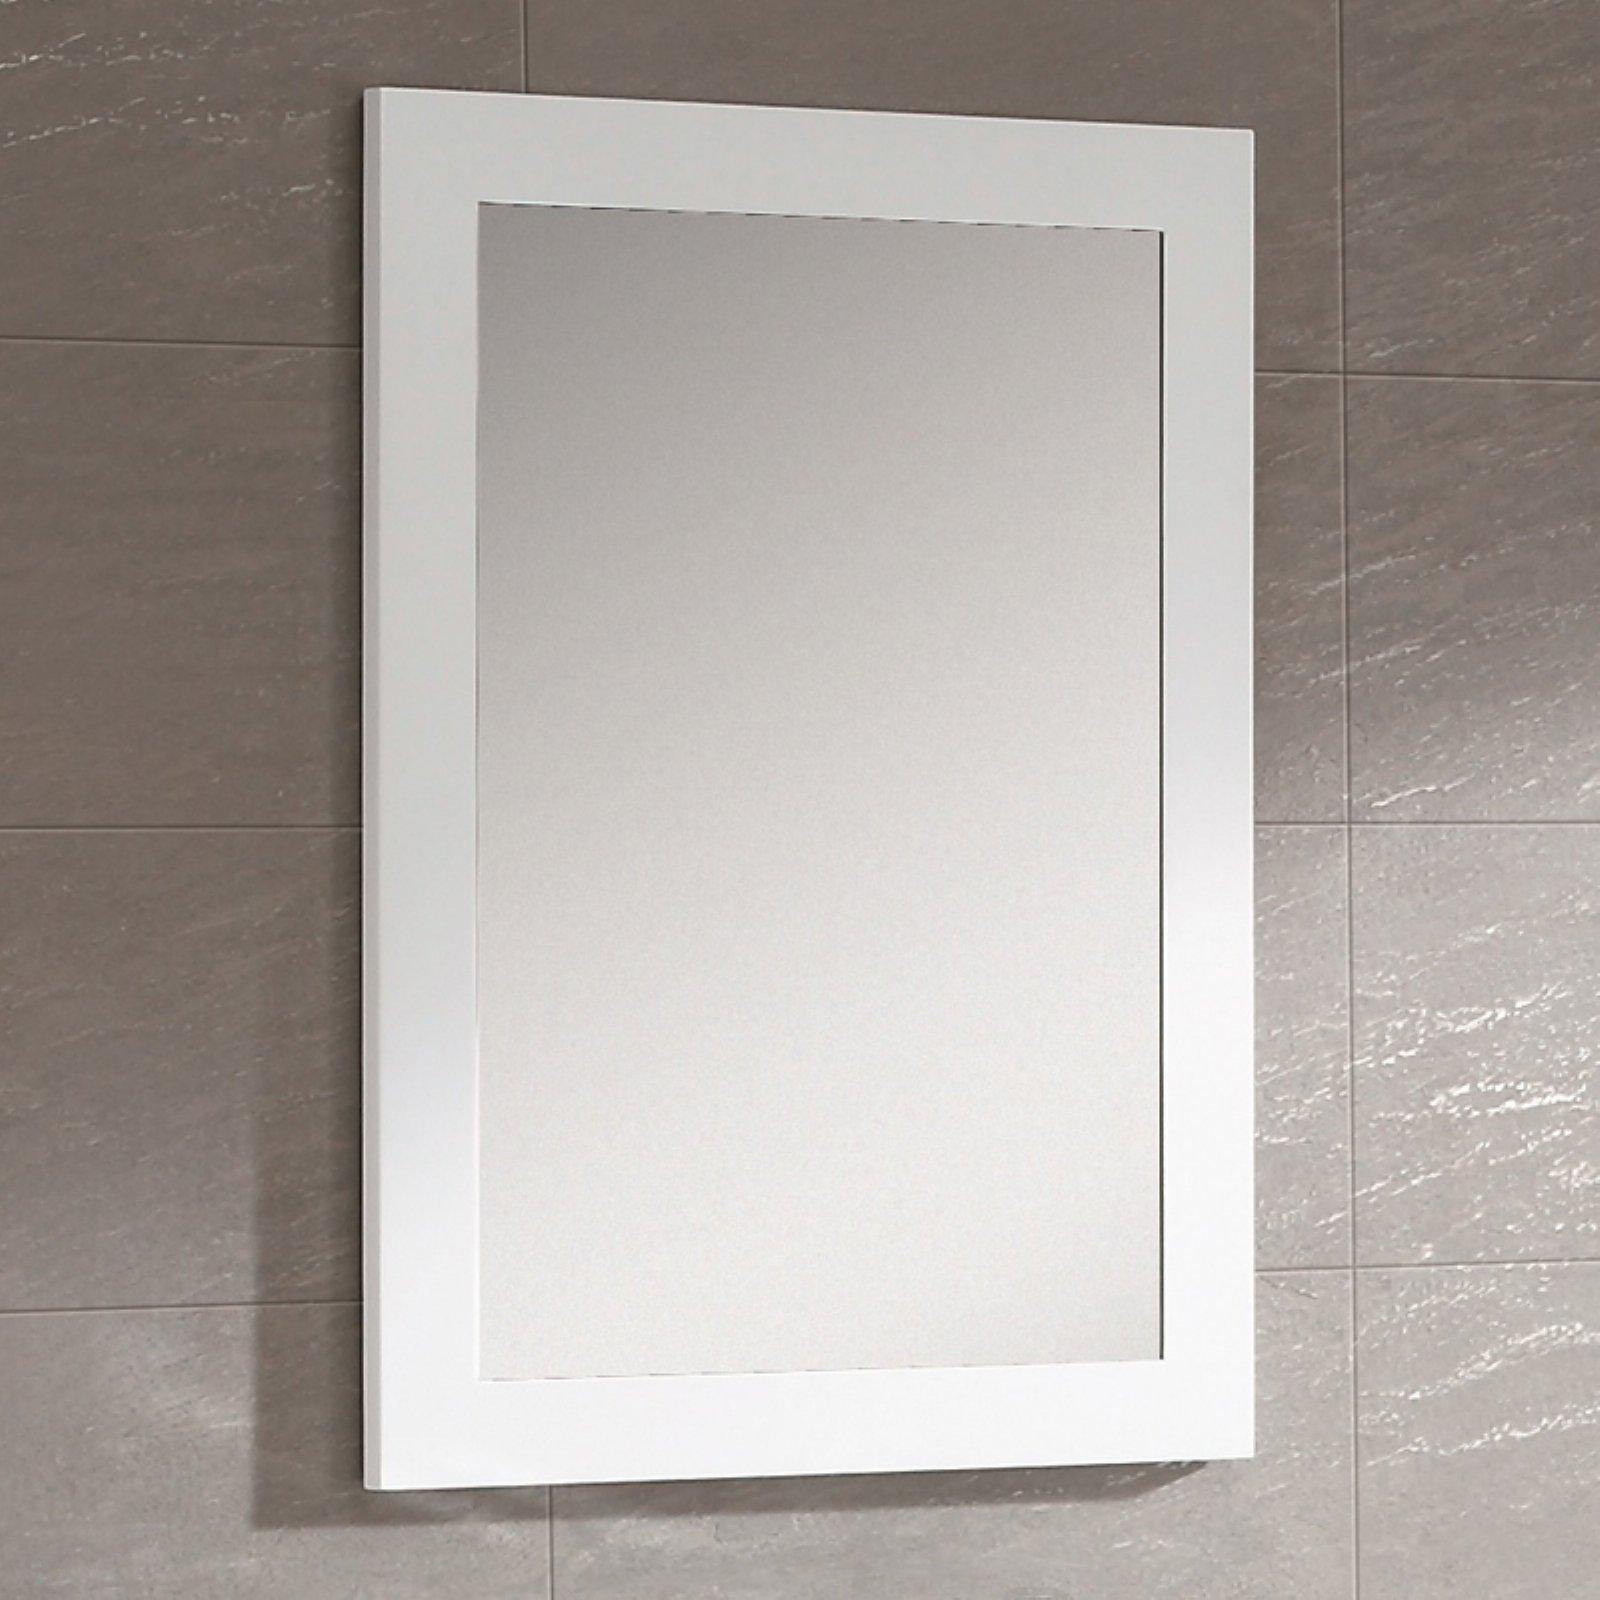 Fine Fixtures Ironwood Bathroom Mirror 29.5W x 33.5H in. by Fine Fixtures